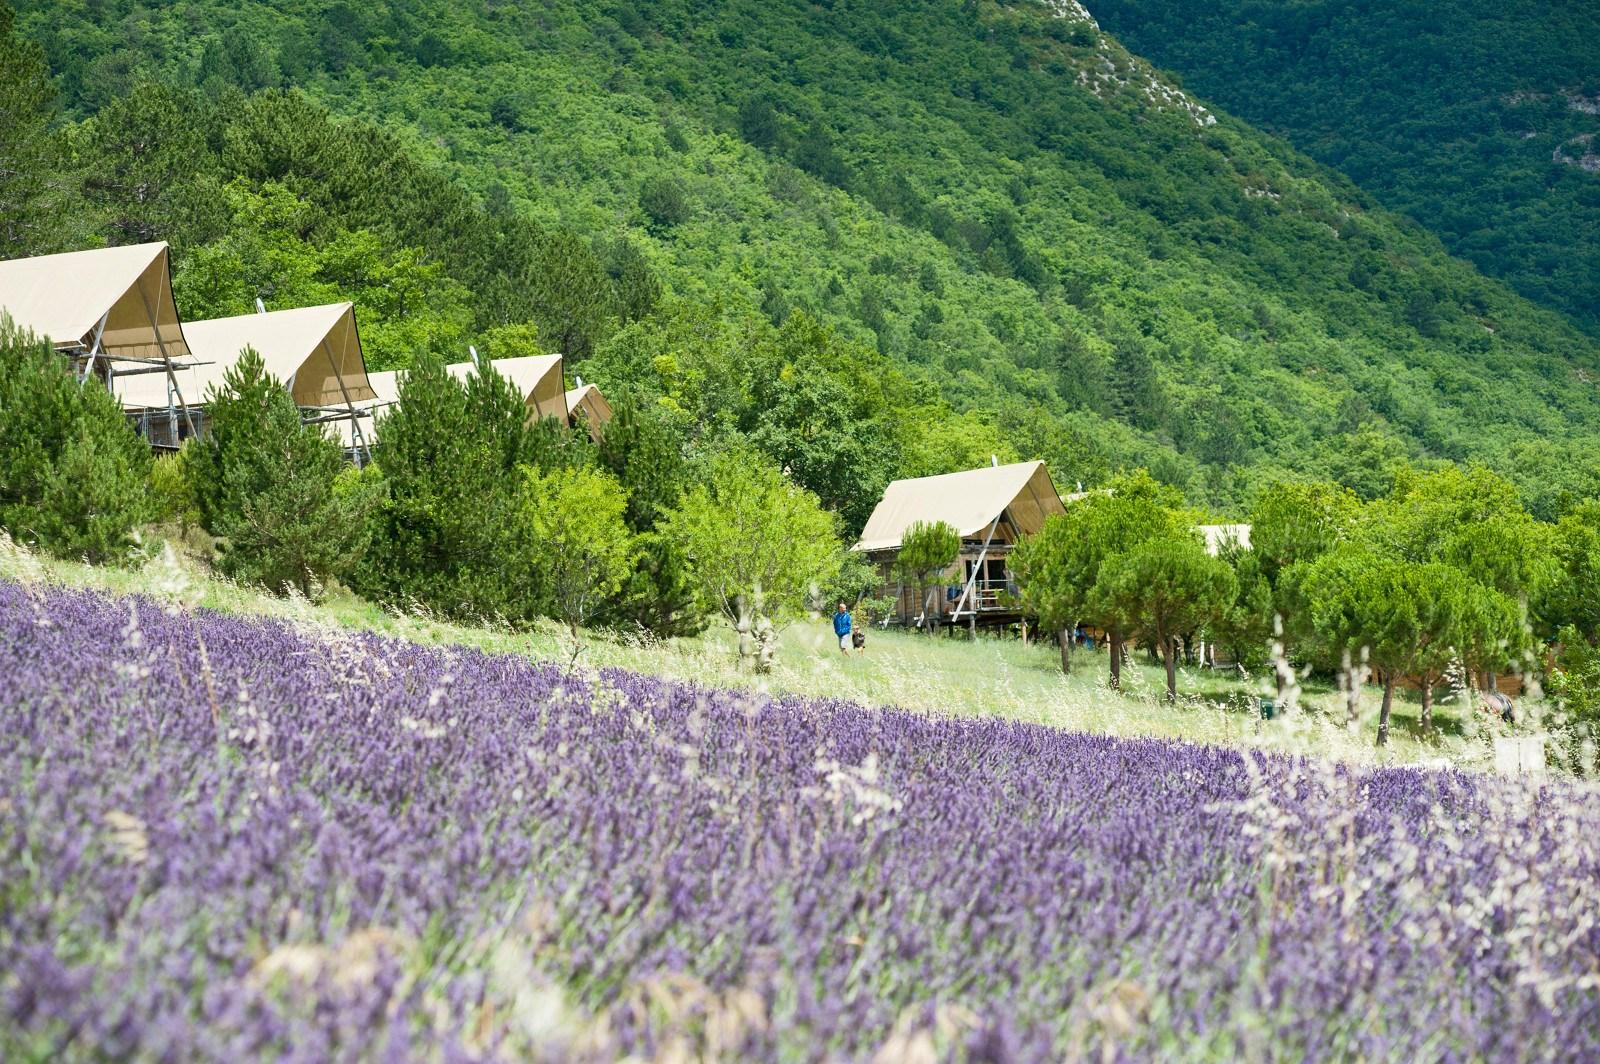 Frankrijk-Dieulefit-Village%20Huttopia%20Dieulefit-ExtraLarge Campings Frankrijk